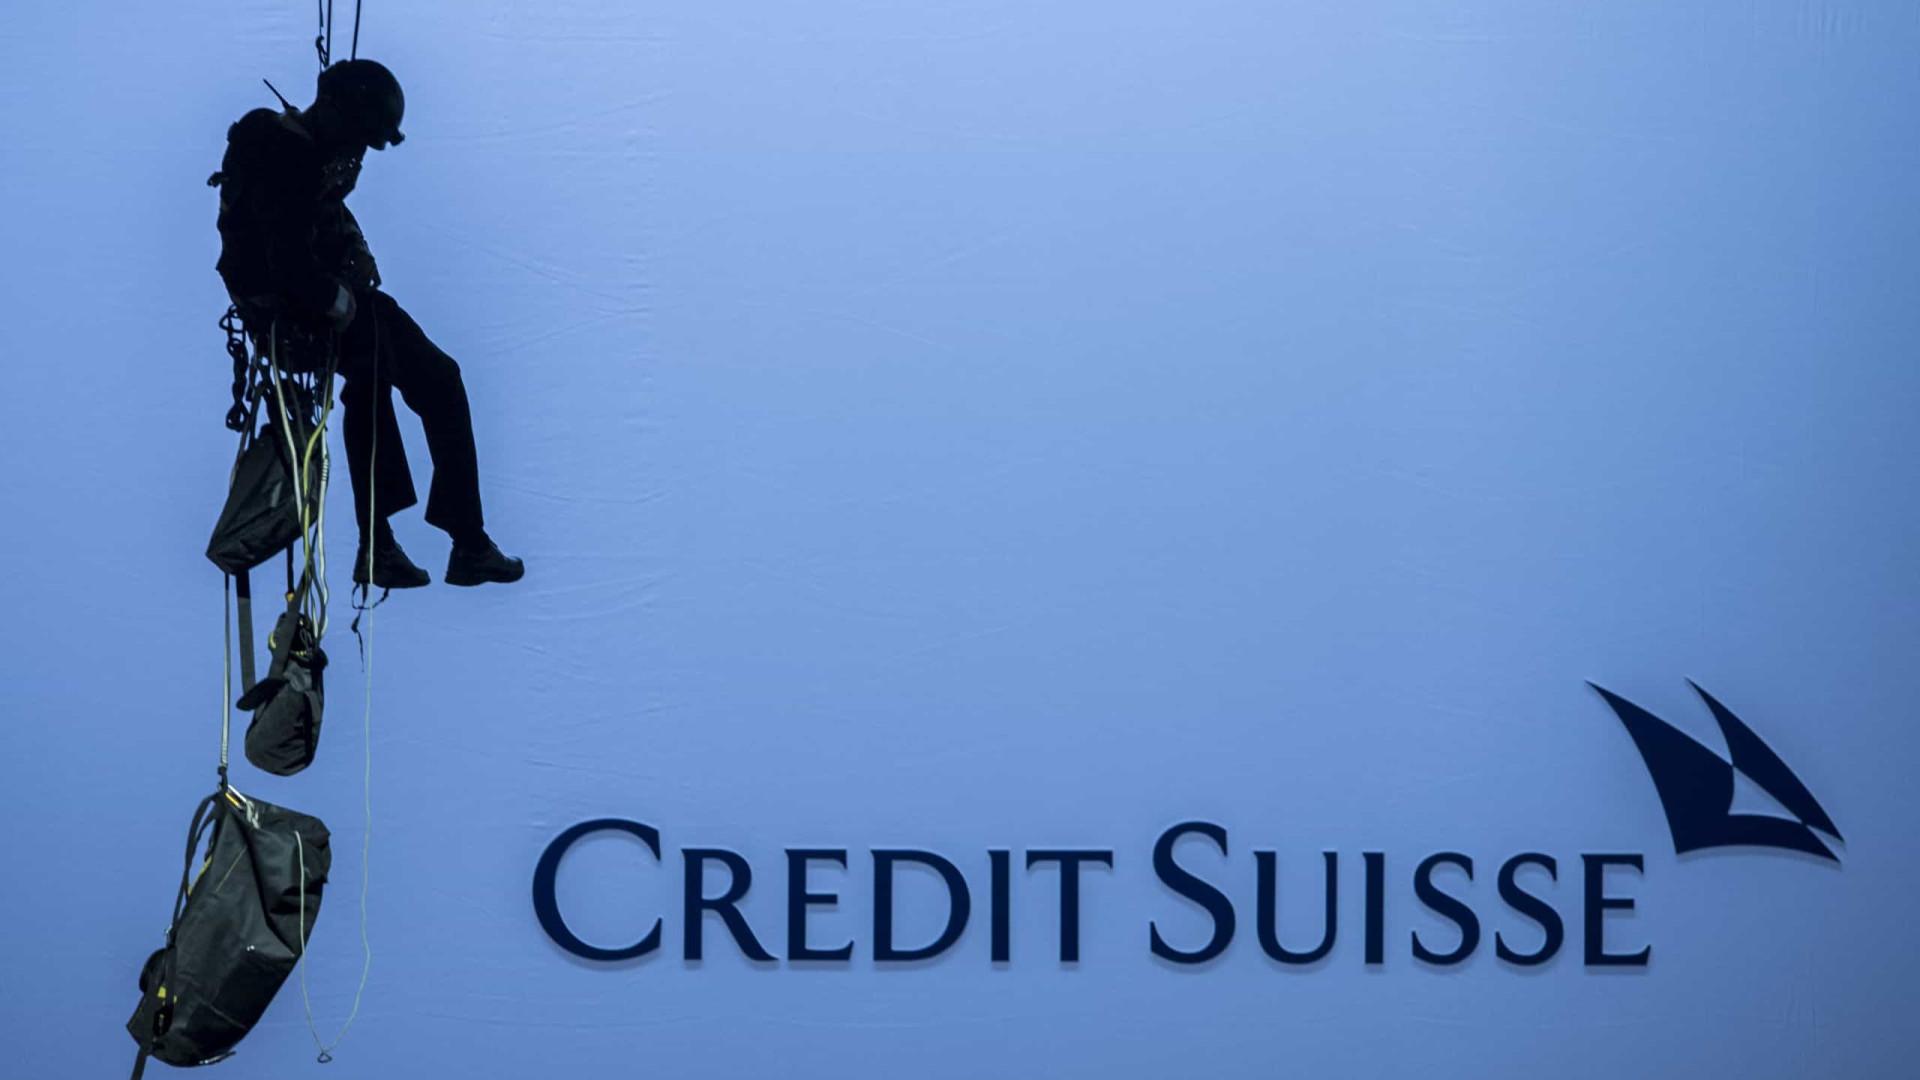 Credit Suisse proibe transações de títulos financeiros venezuelanos